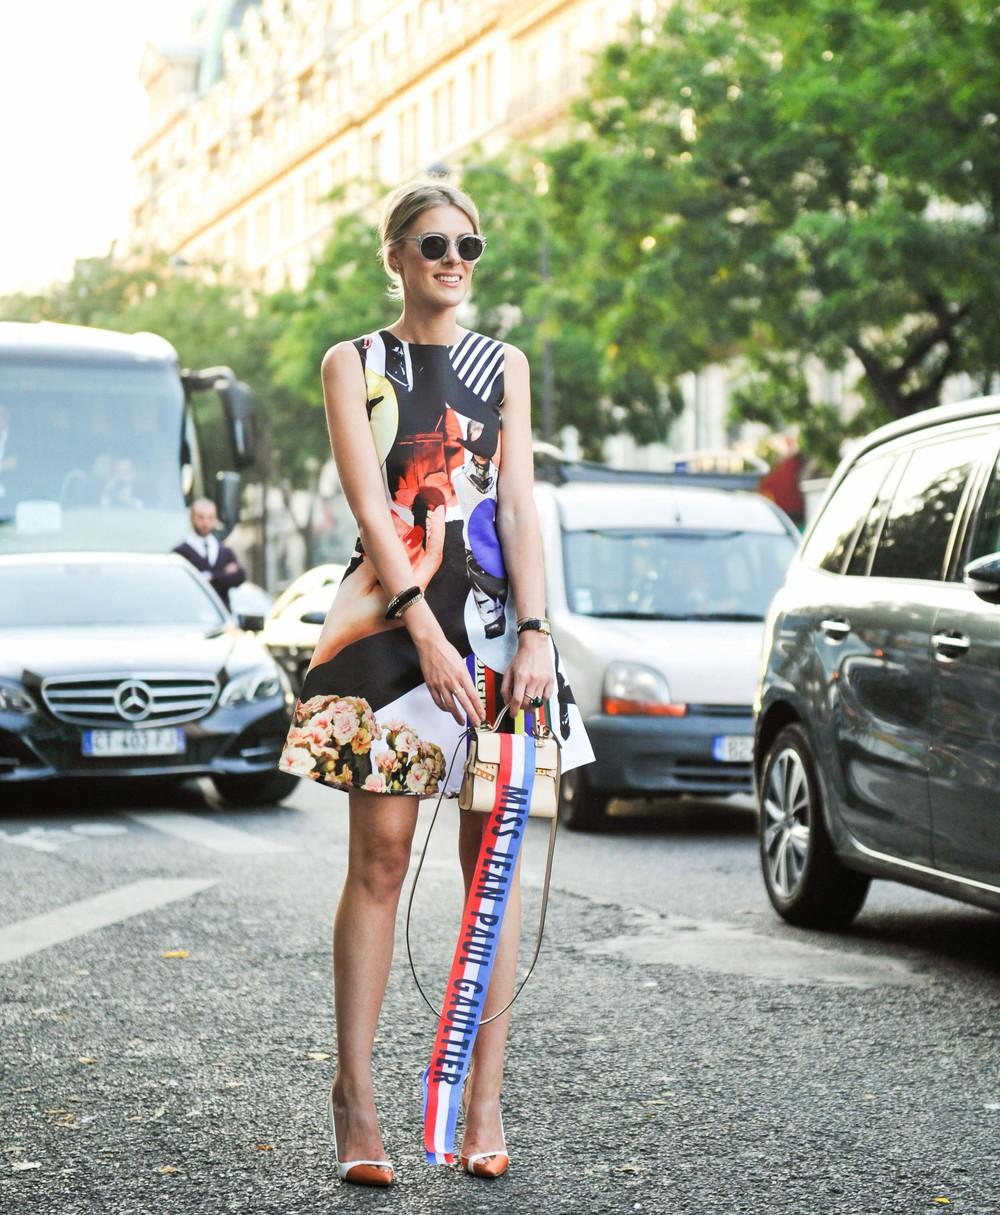 StreetStyle_ParisFashionWeek_LeandroJusten_128.jpg